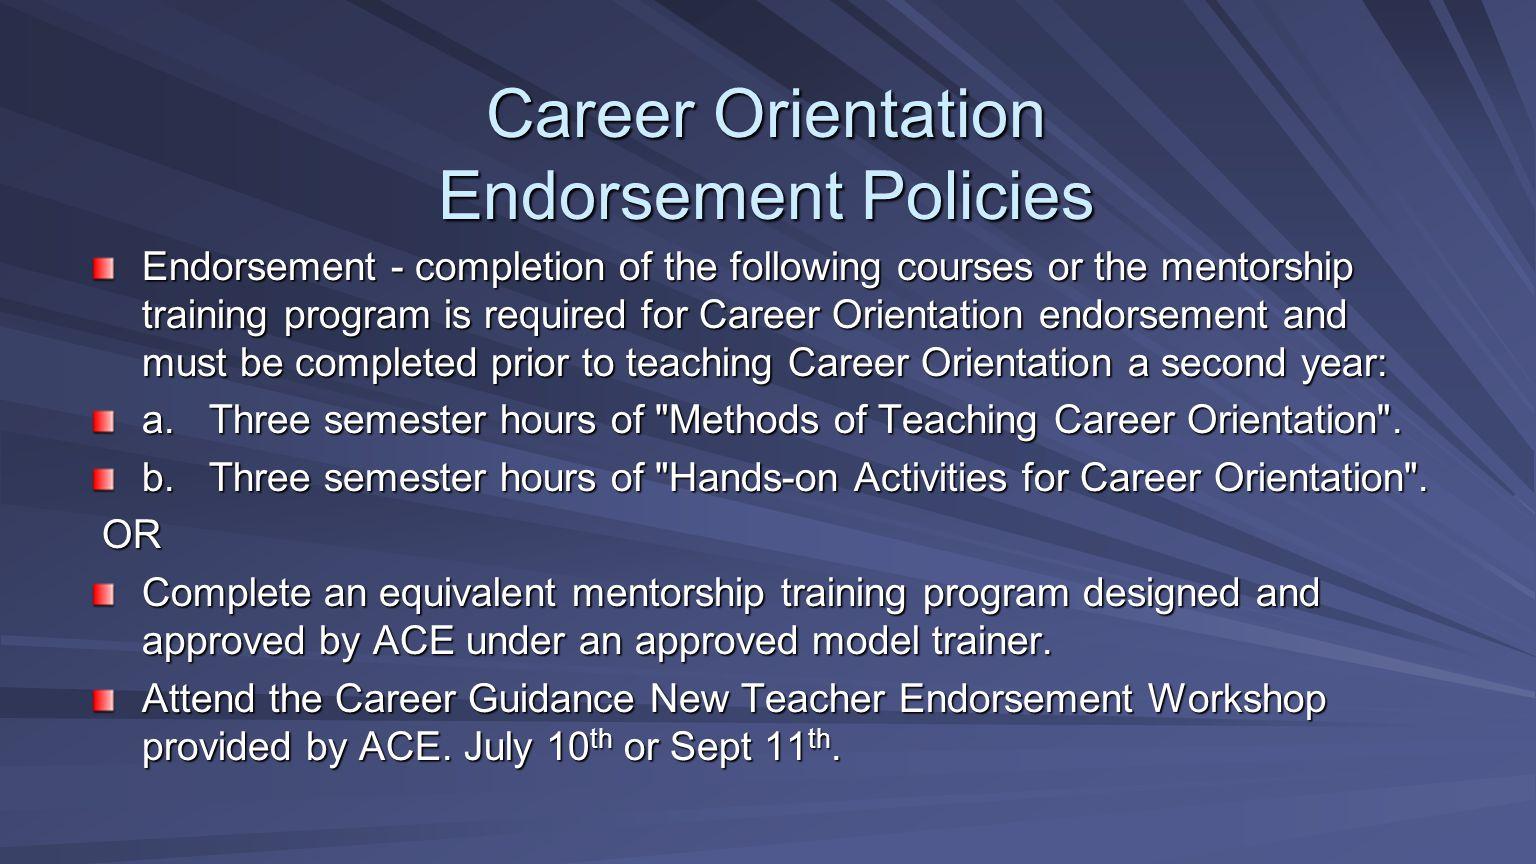 Career Orientation Endorsement Policies